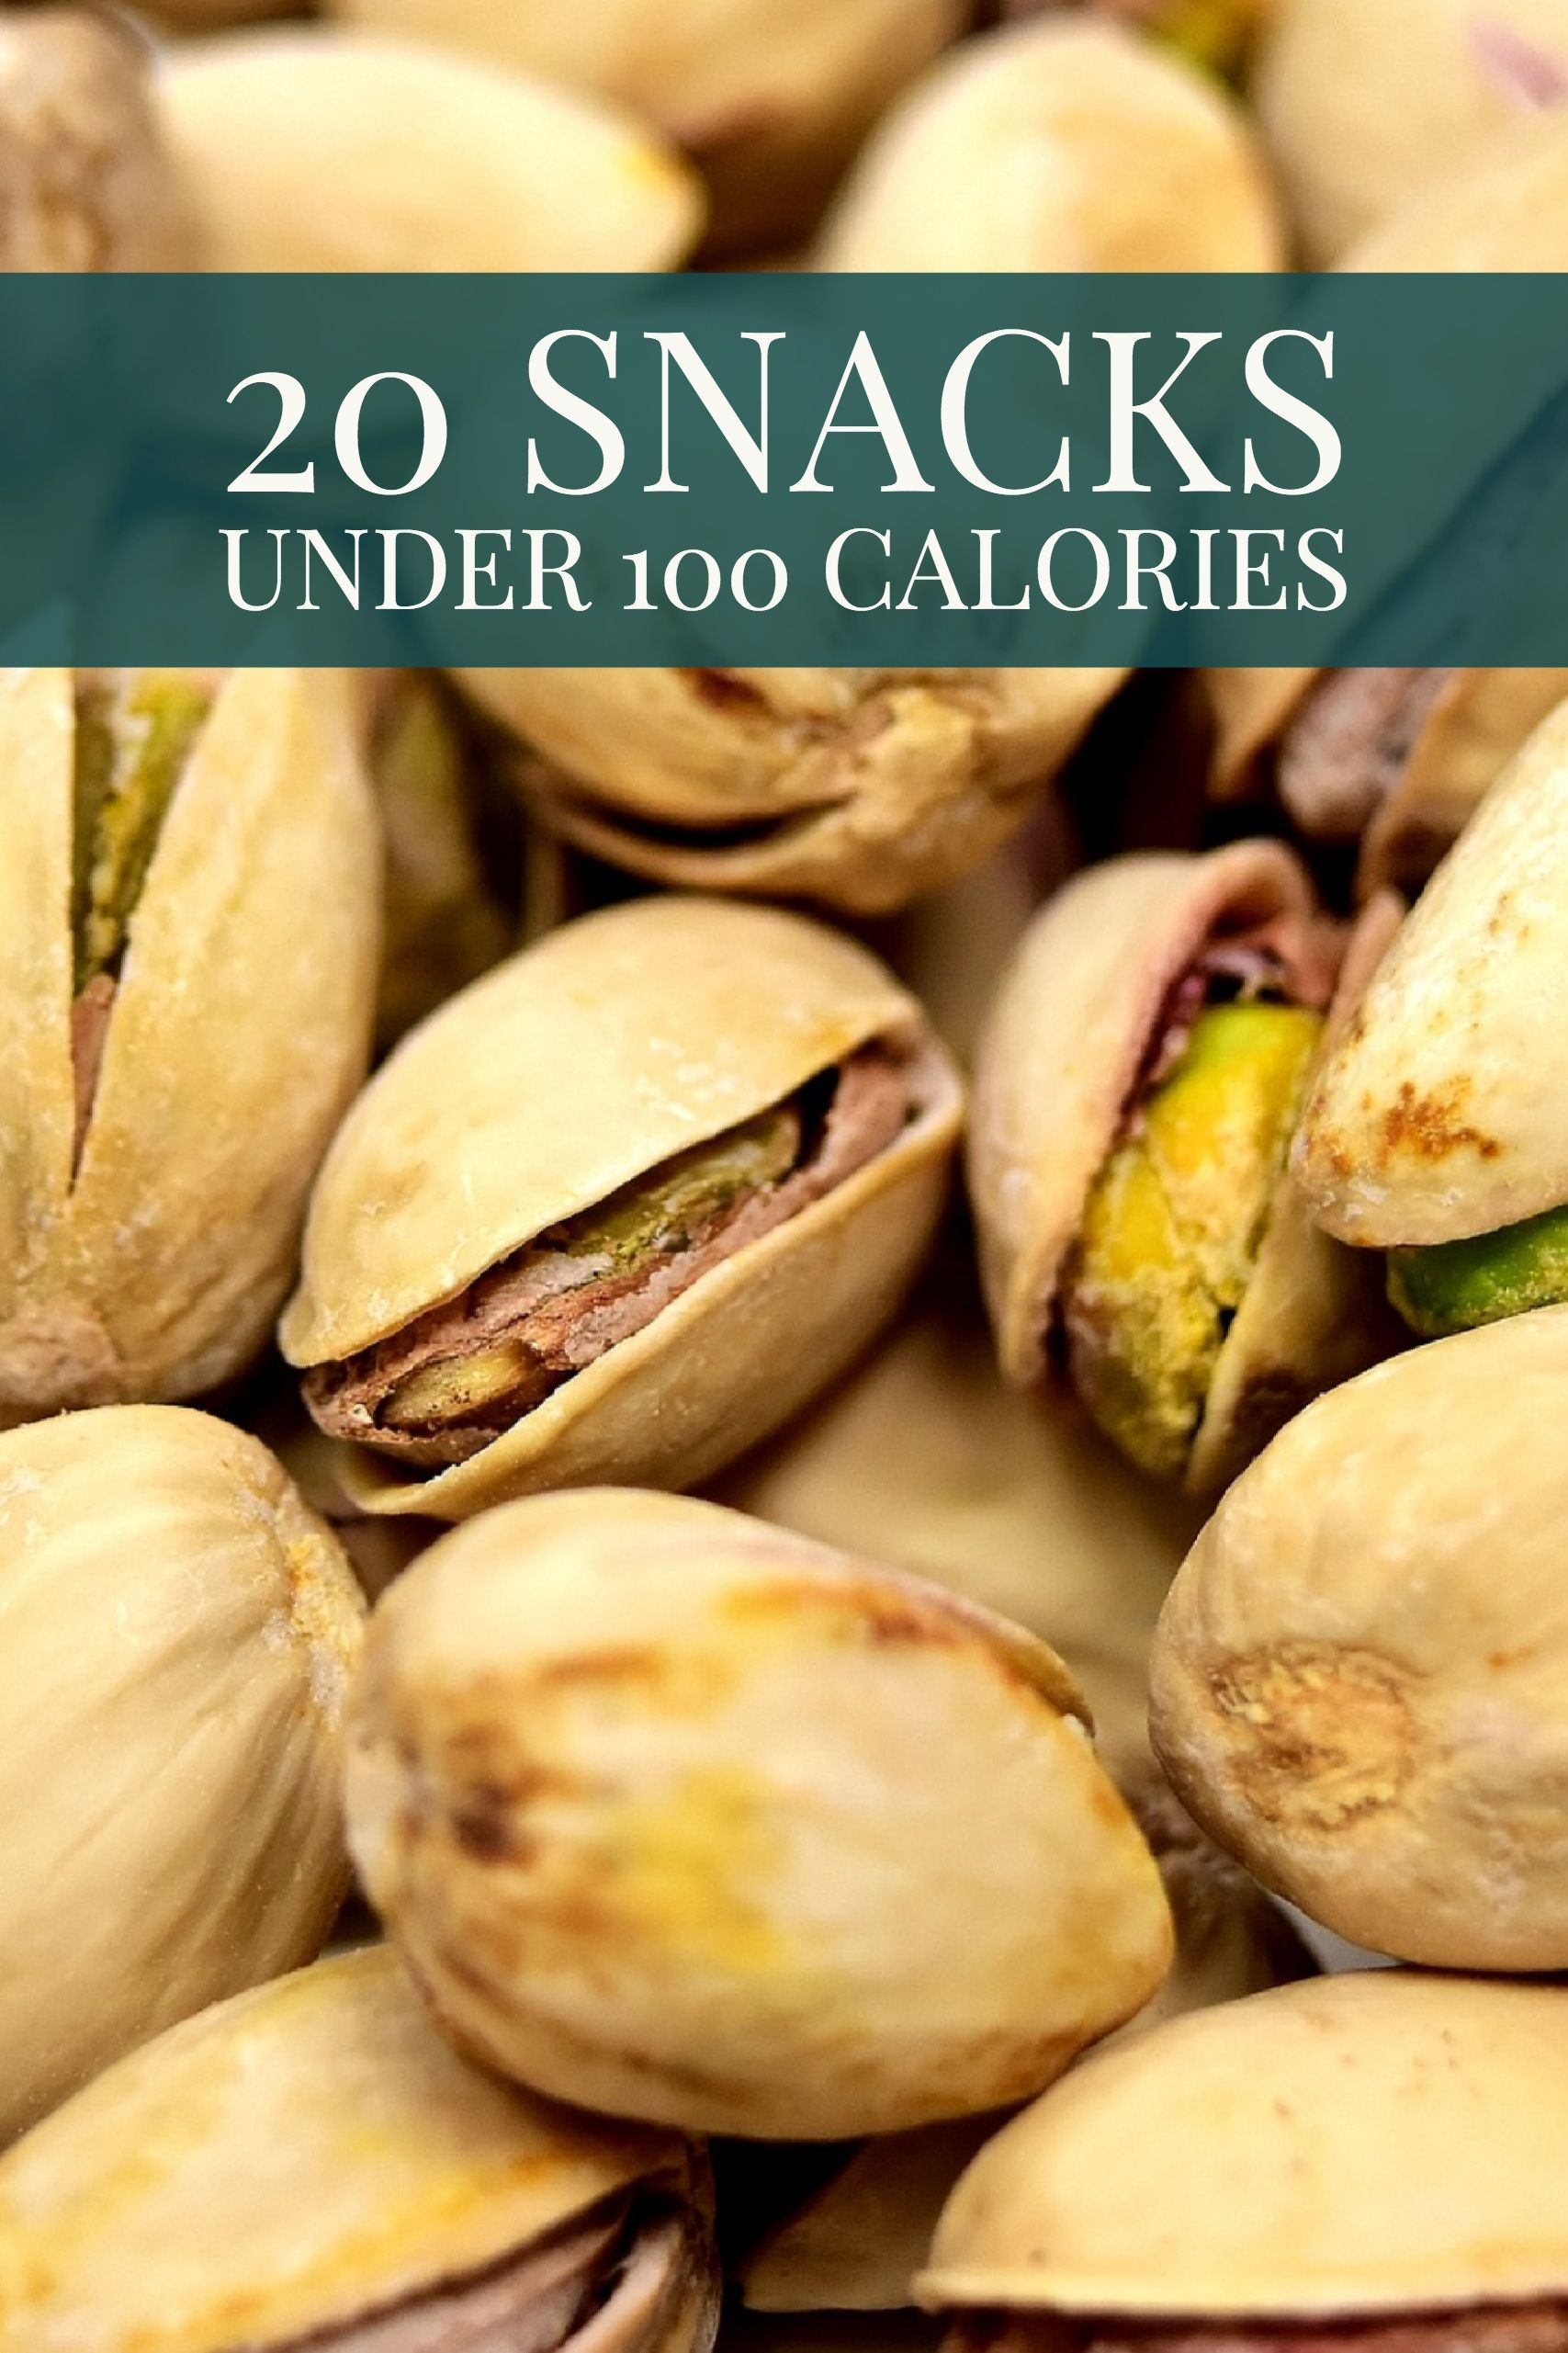 20 Snacks Under 100 Calories picture